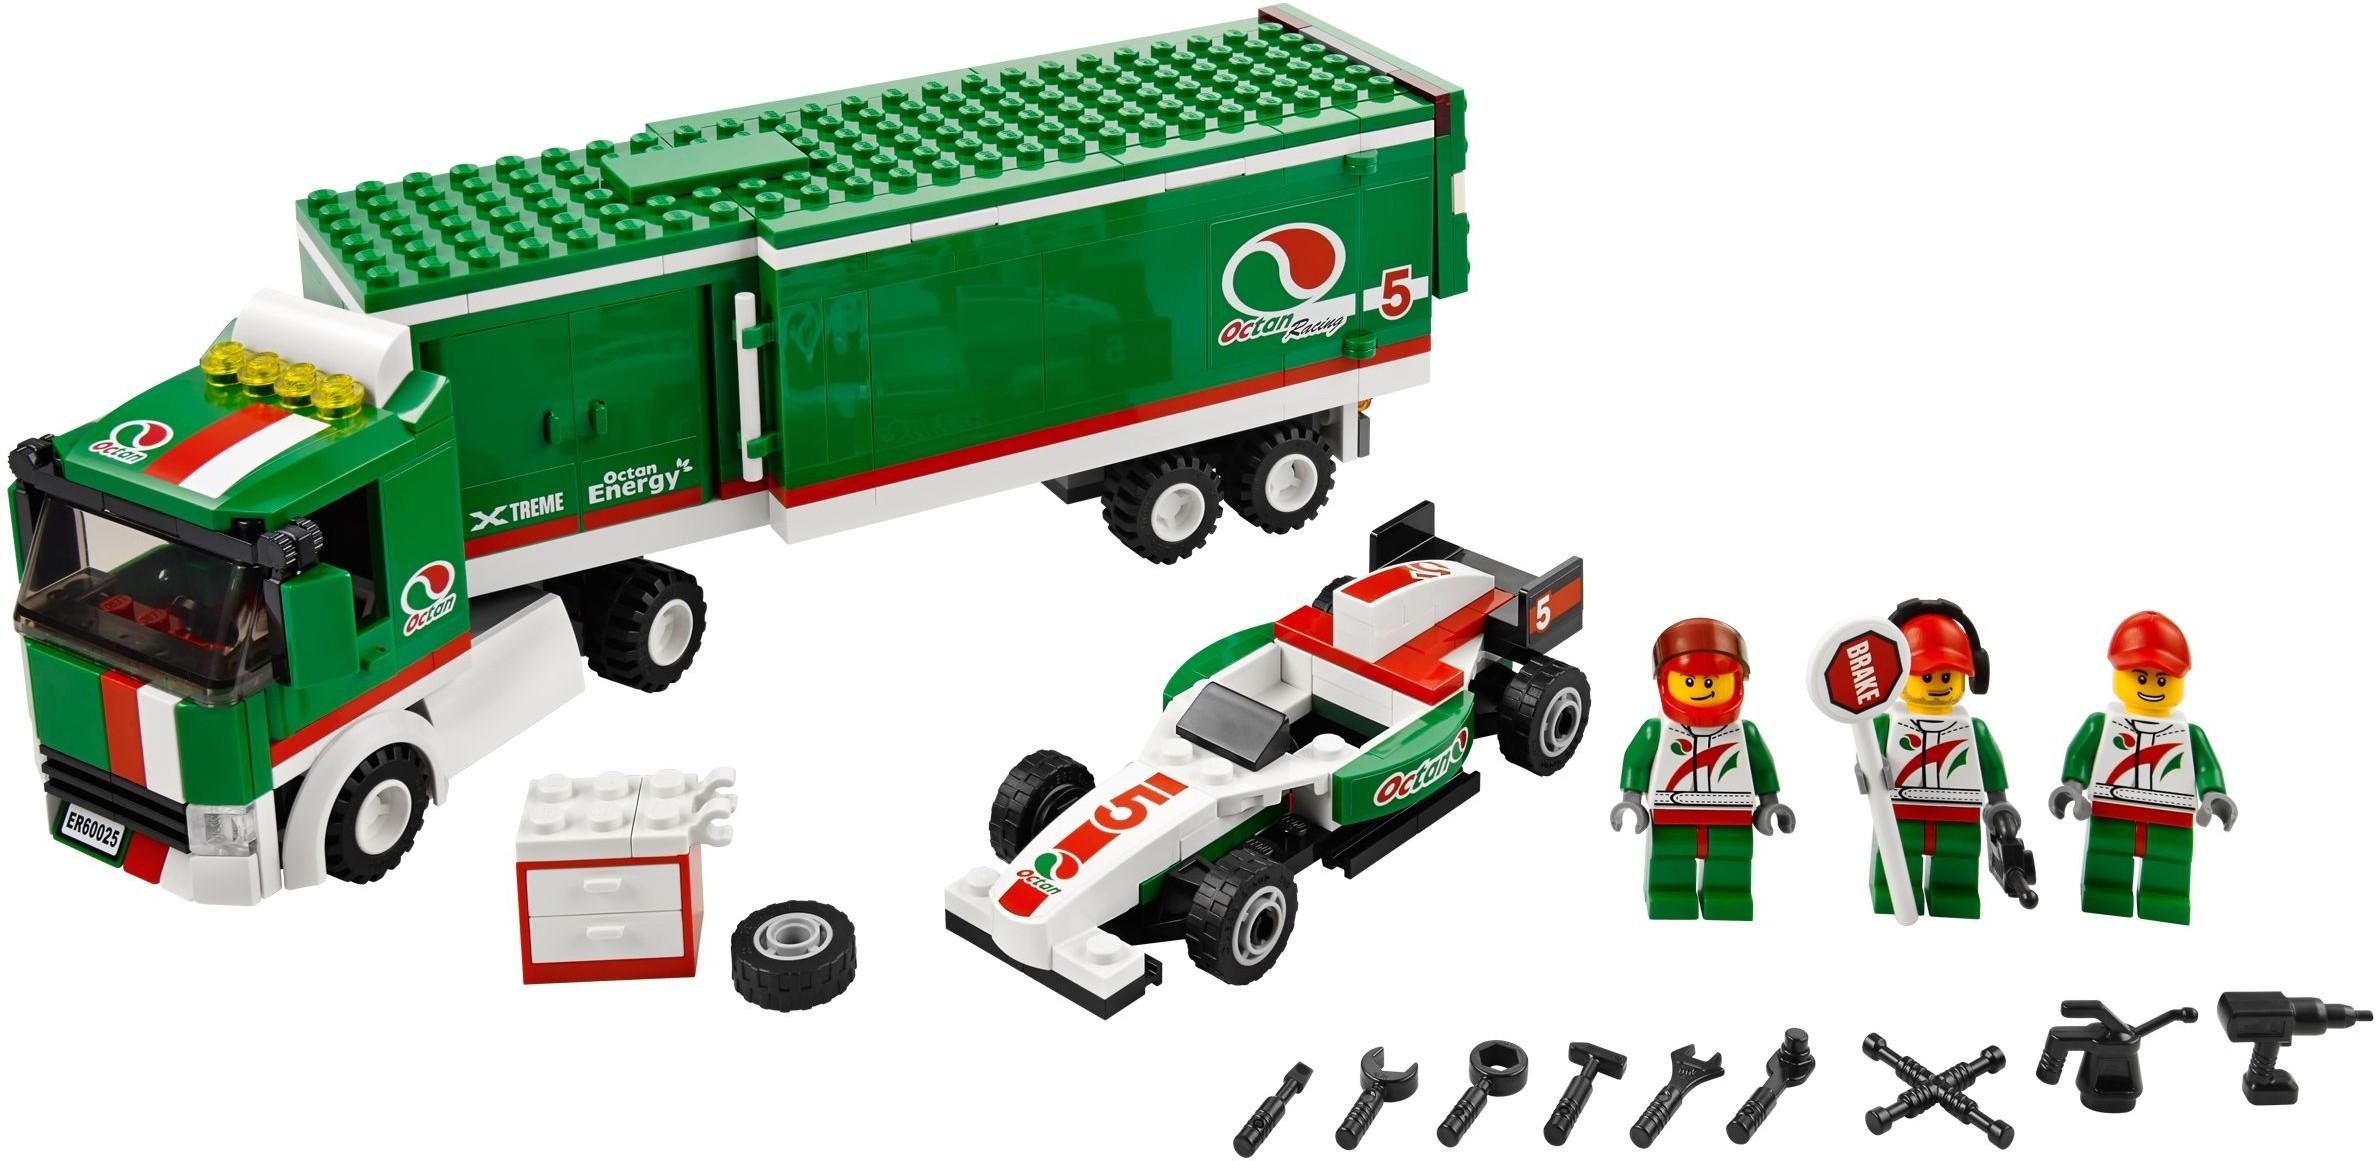 Formel1 Truck 60025